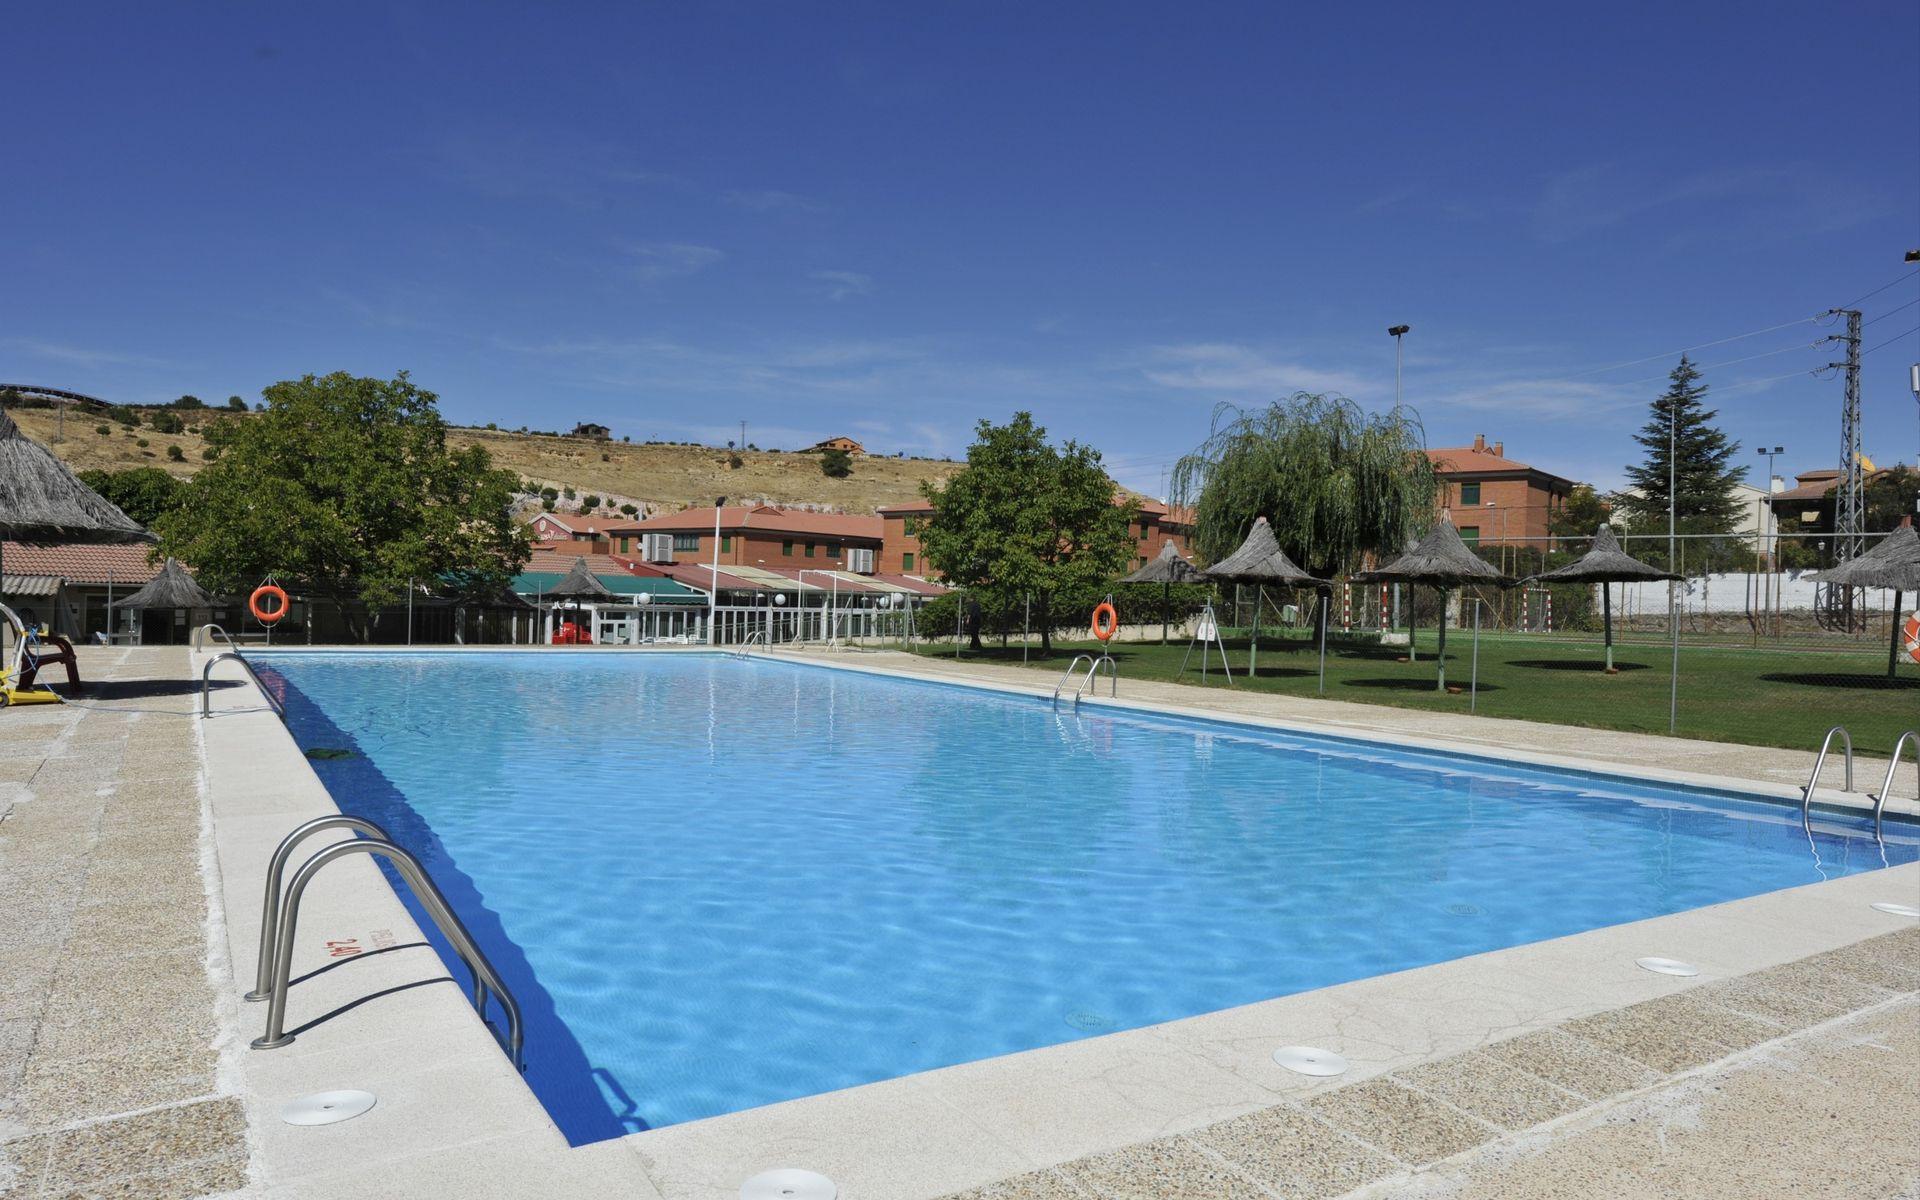 Hotel puerta de segovia segovia logitravel for Hotel piscina segovia